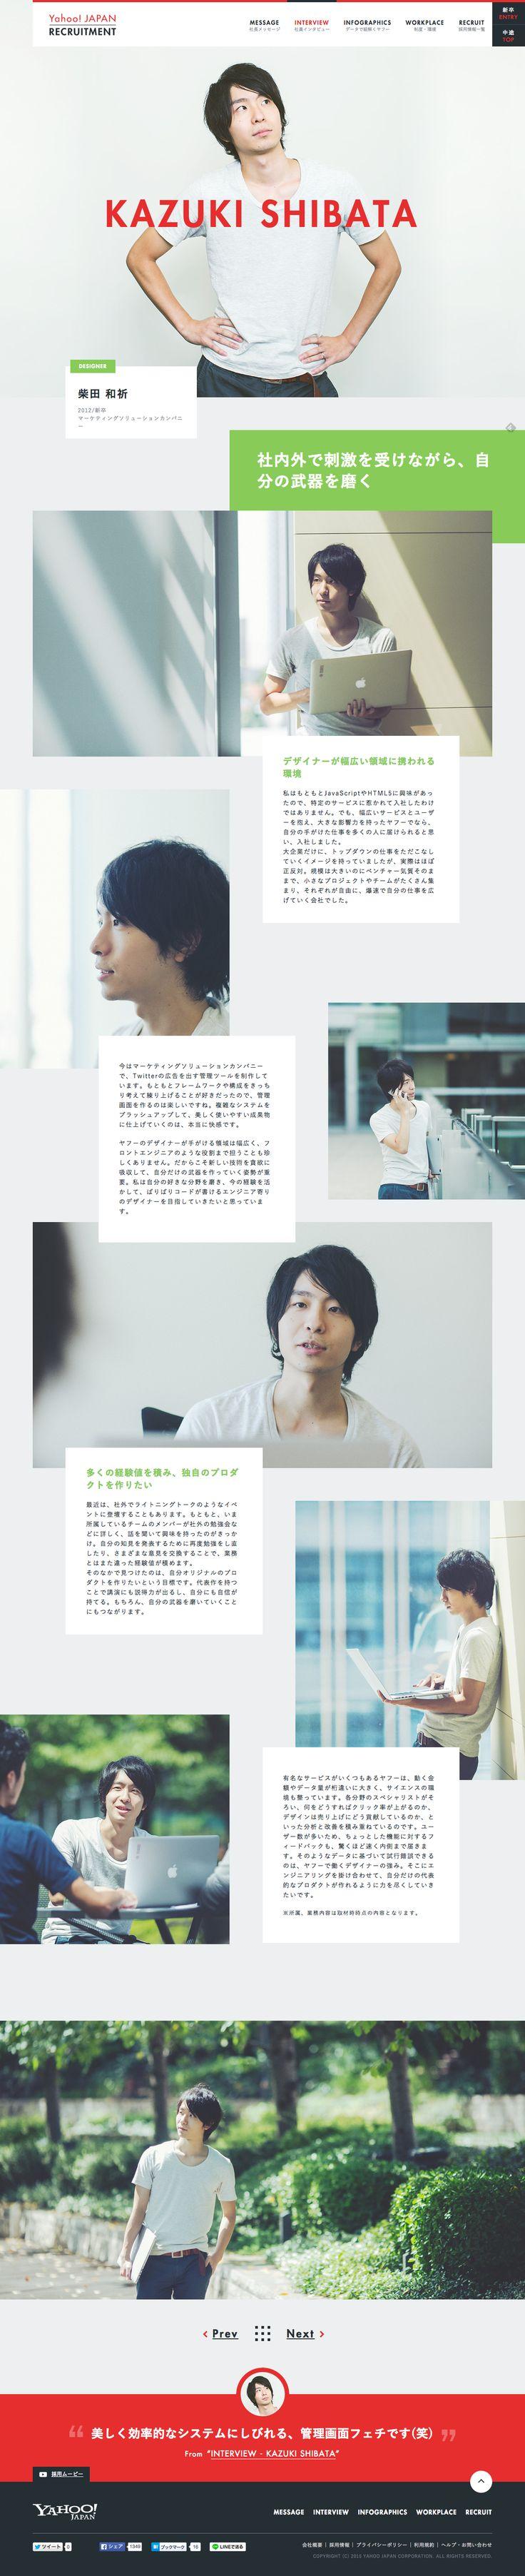 Yahoo! JAPAN RECRUITMENT